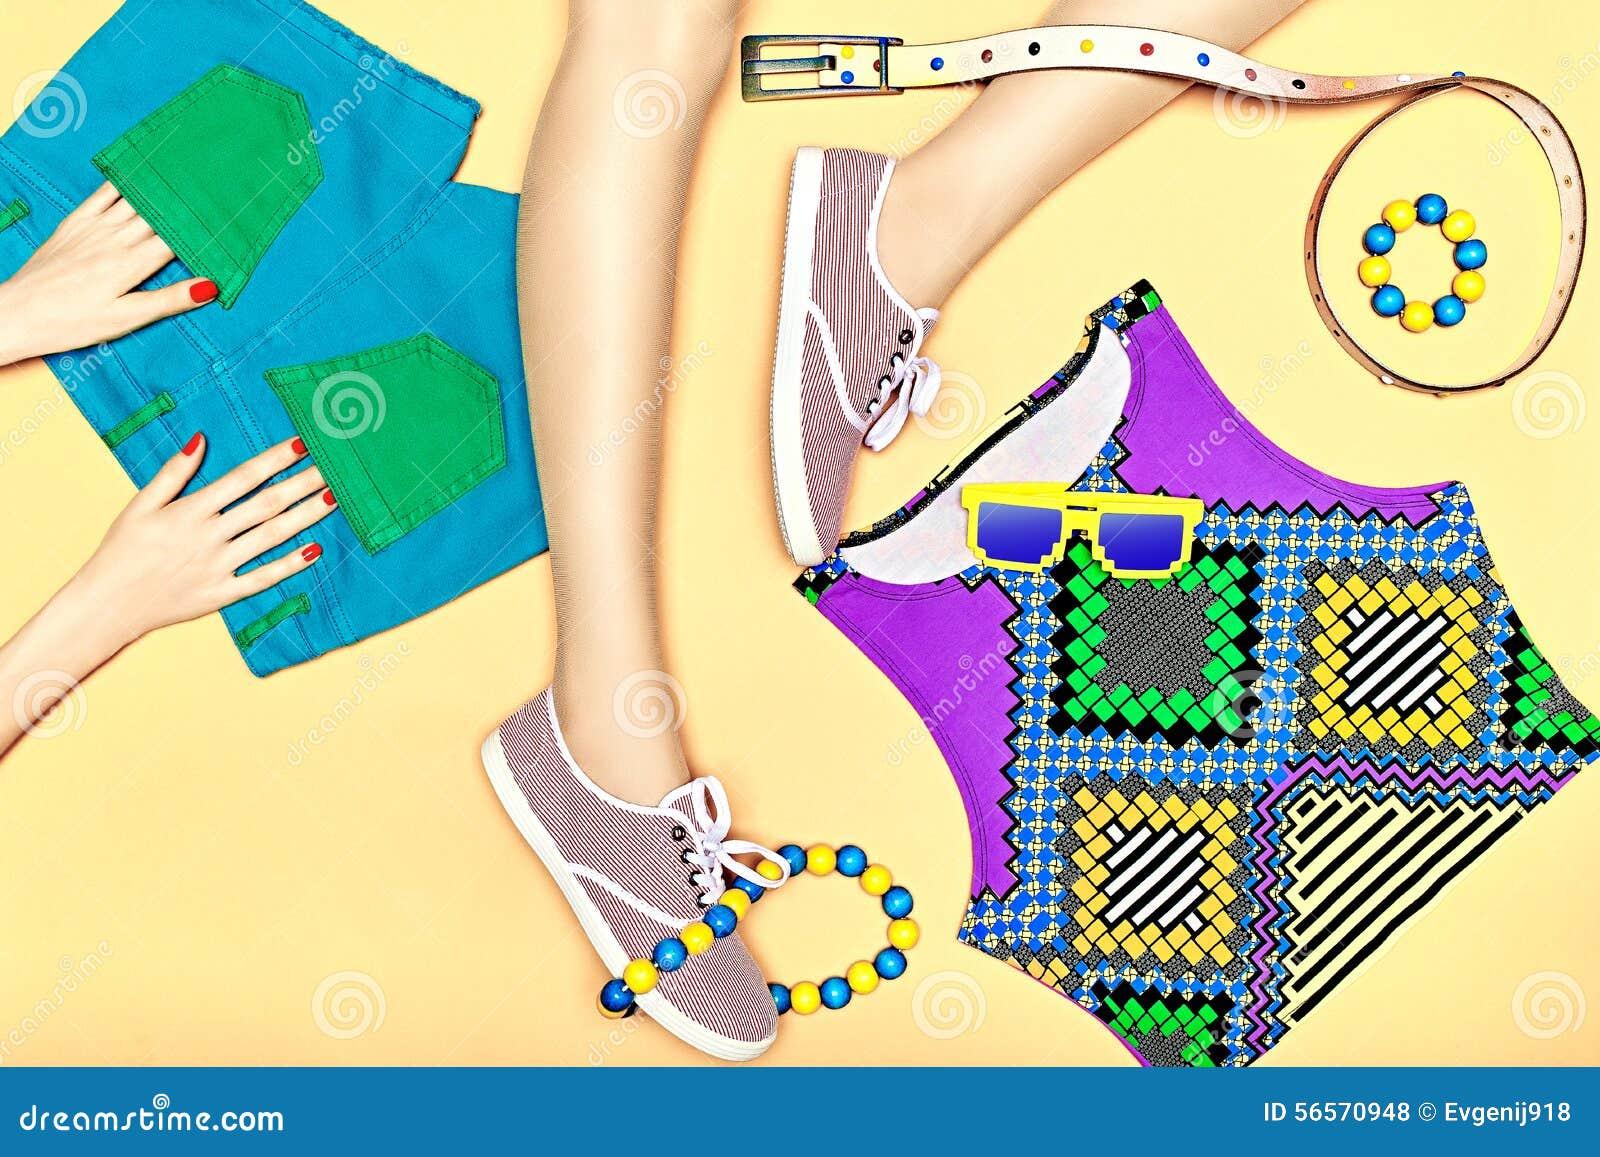 Download Προκλητικά λεπτά πόδια γυναίκας με το σύνολο μοντέρνου καθιερώνοντος τη μόδα Στοκ Εικόνες - εικόνα από εύθυμος, αστικός: 56570948